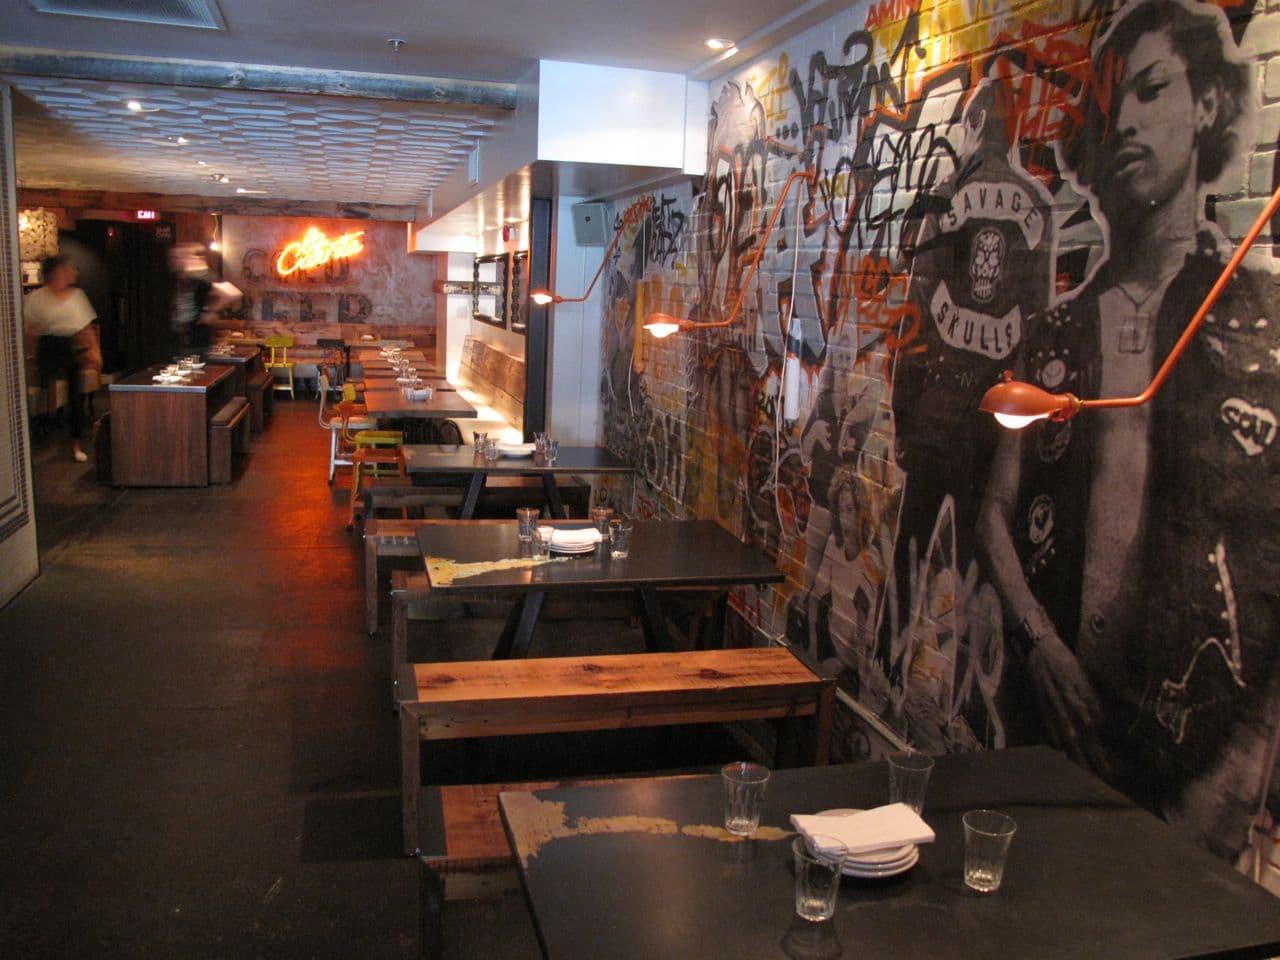 La Carnita helped make Toronto tacos trendy in Little Italy.